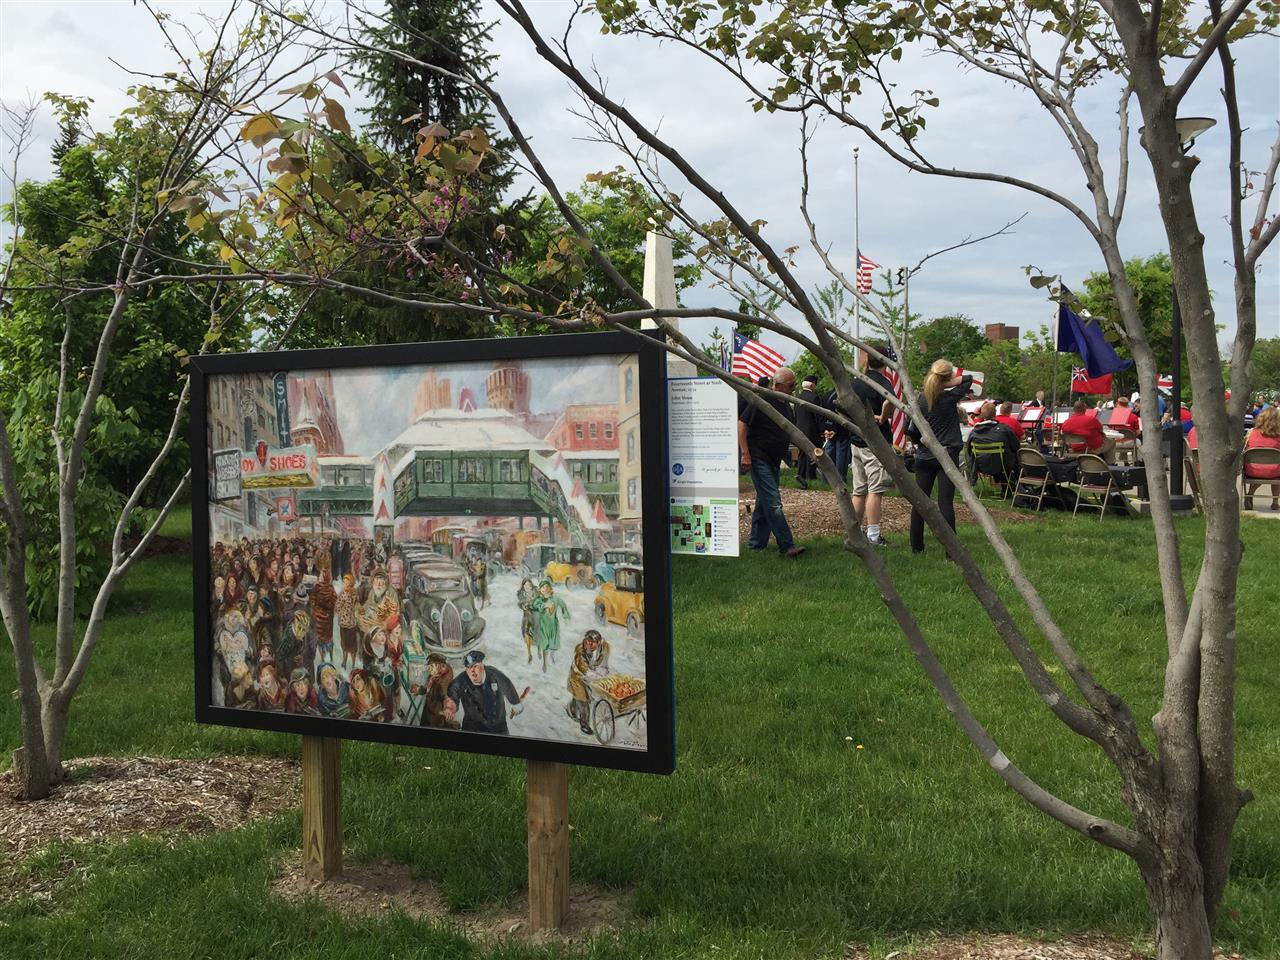 "Detroit Institute of Arts' ""Inside Out"" art instillation in Shain Park, the setting for the Memorial Day ceremony. Birmingham, Michigan #LeadingRElocal #Birmingham #Michigan"